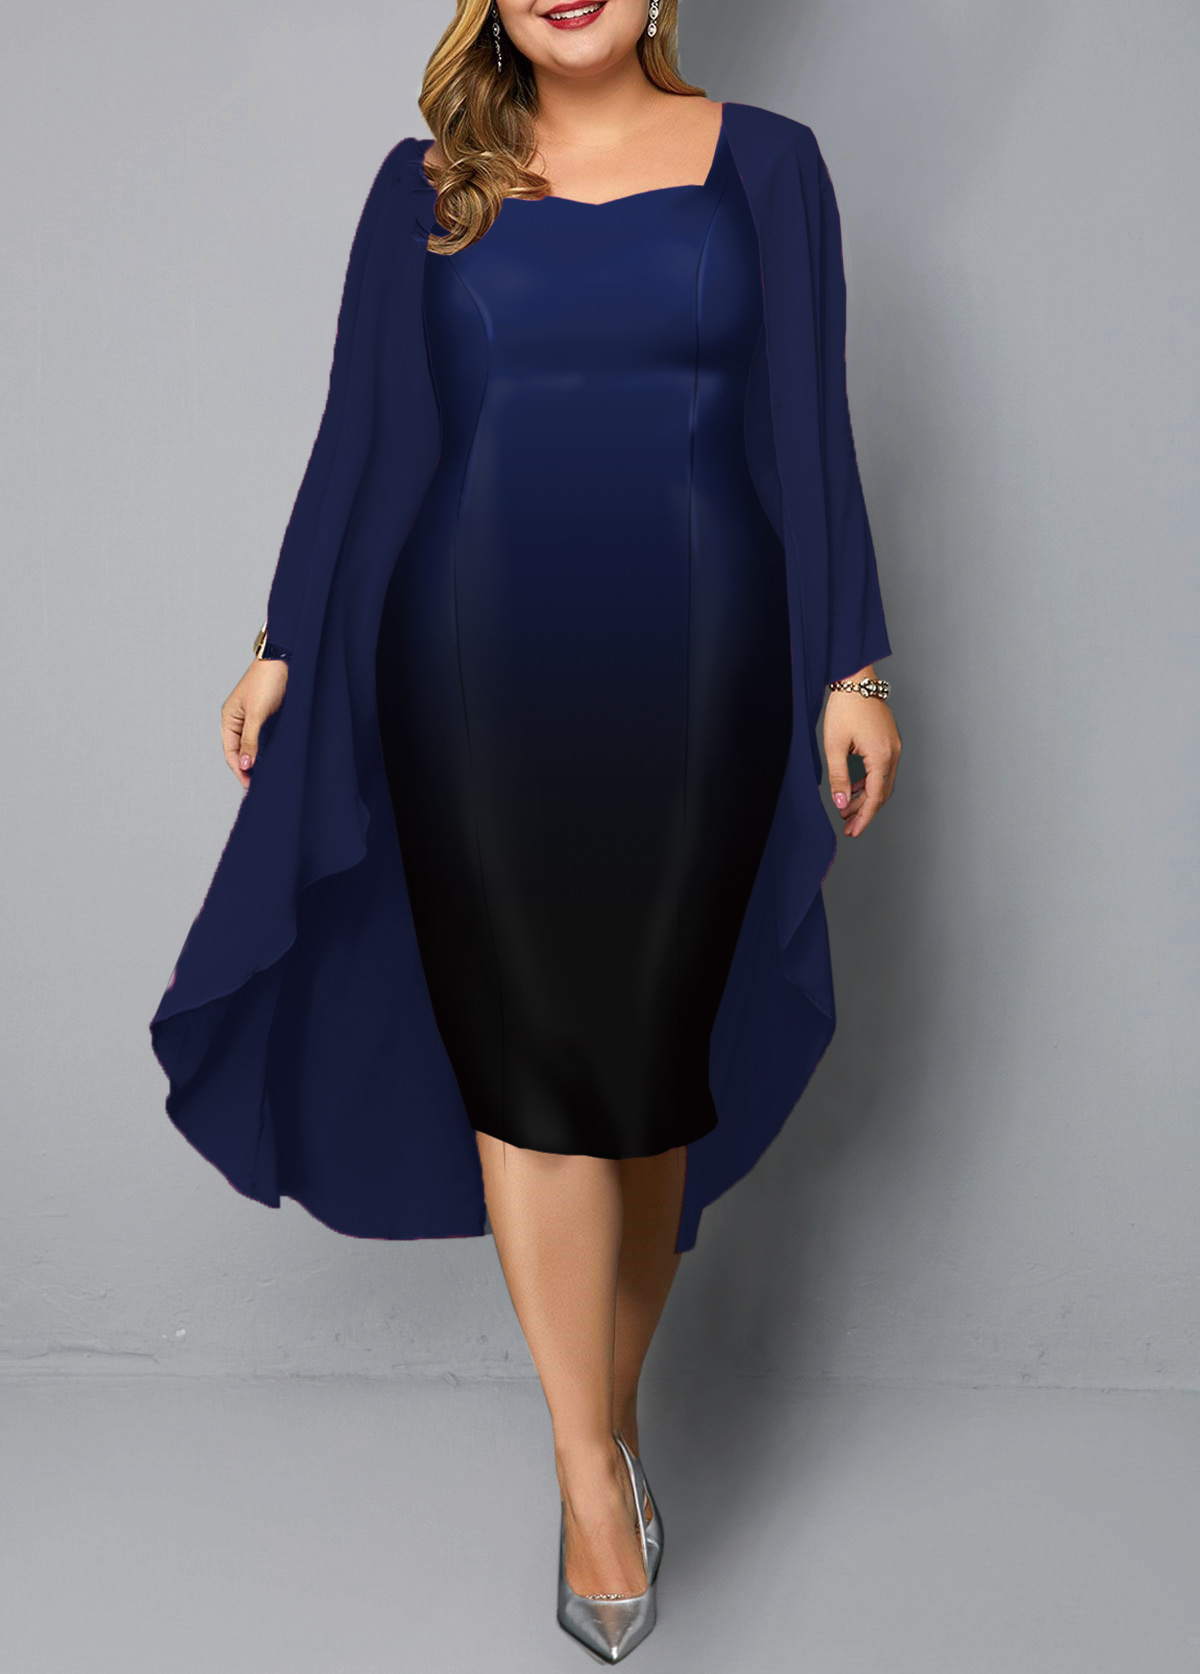 Plus Size Long Sleeve Chiffon Cardigan and Gradient Dress